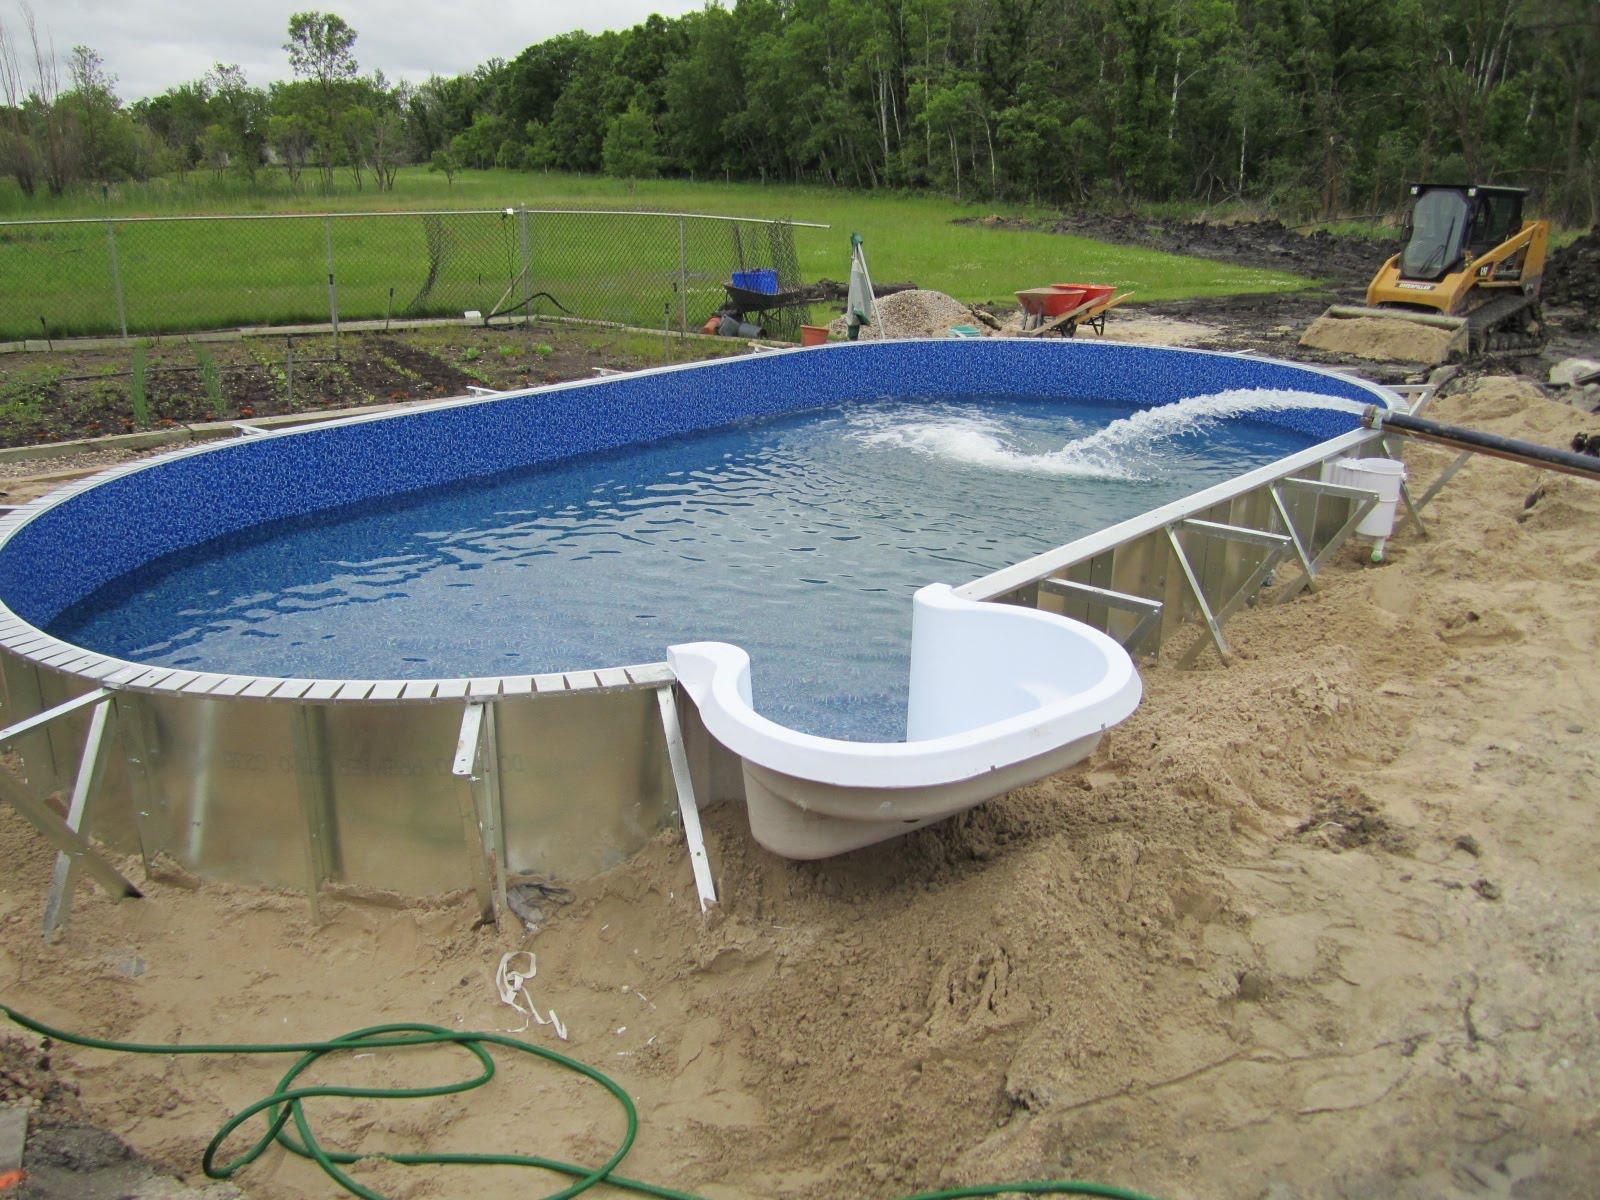 Pictures of 16x32 inground pool joy studio design for Inground pool pics